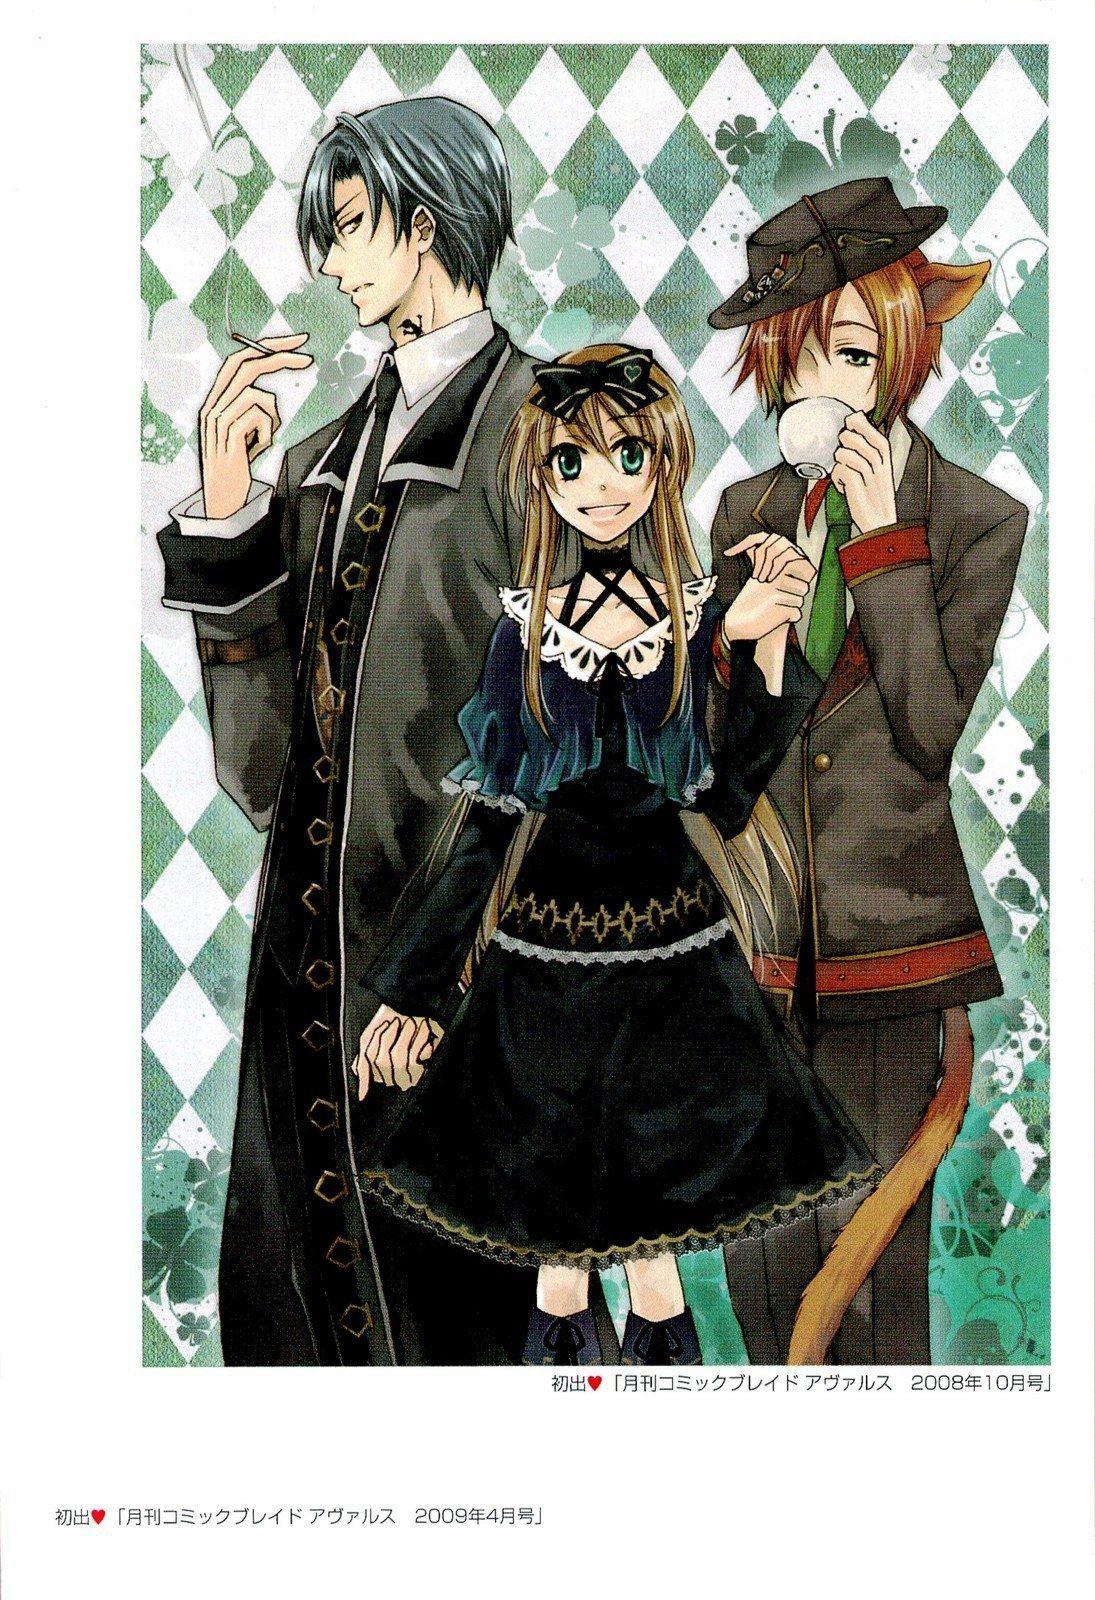 Heart No Kuni No Alice - Capitulo 35 - 47 - Animextremist USTEDES DOS MUÉRANSE.. EN NINGÚN MOMENTO DEL MANGA SE DIGNARON A APARECER!!